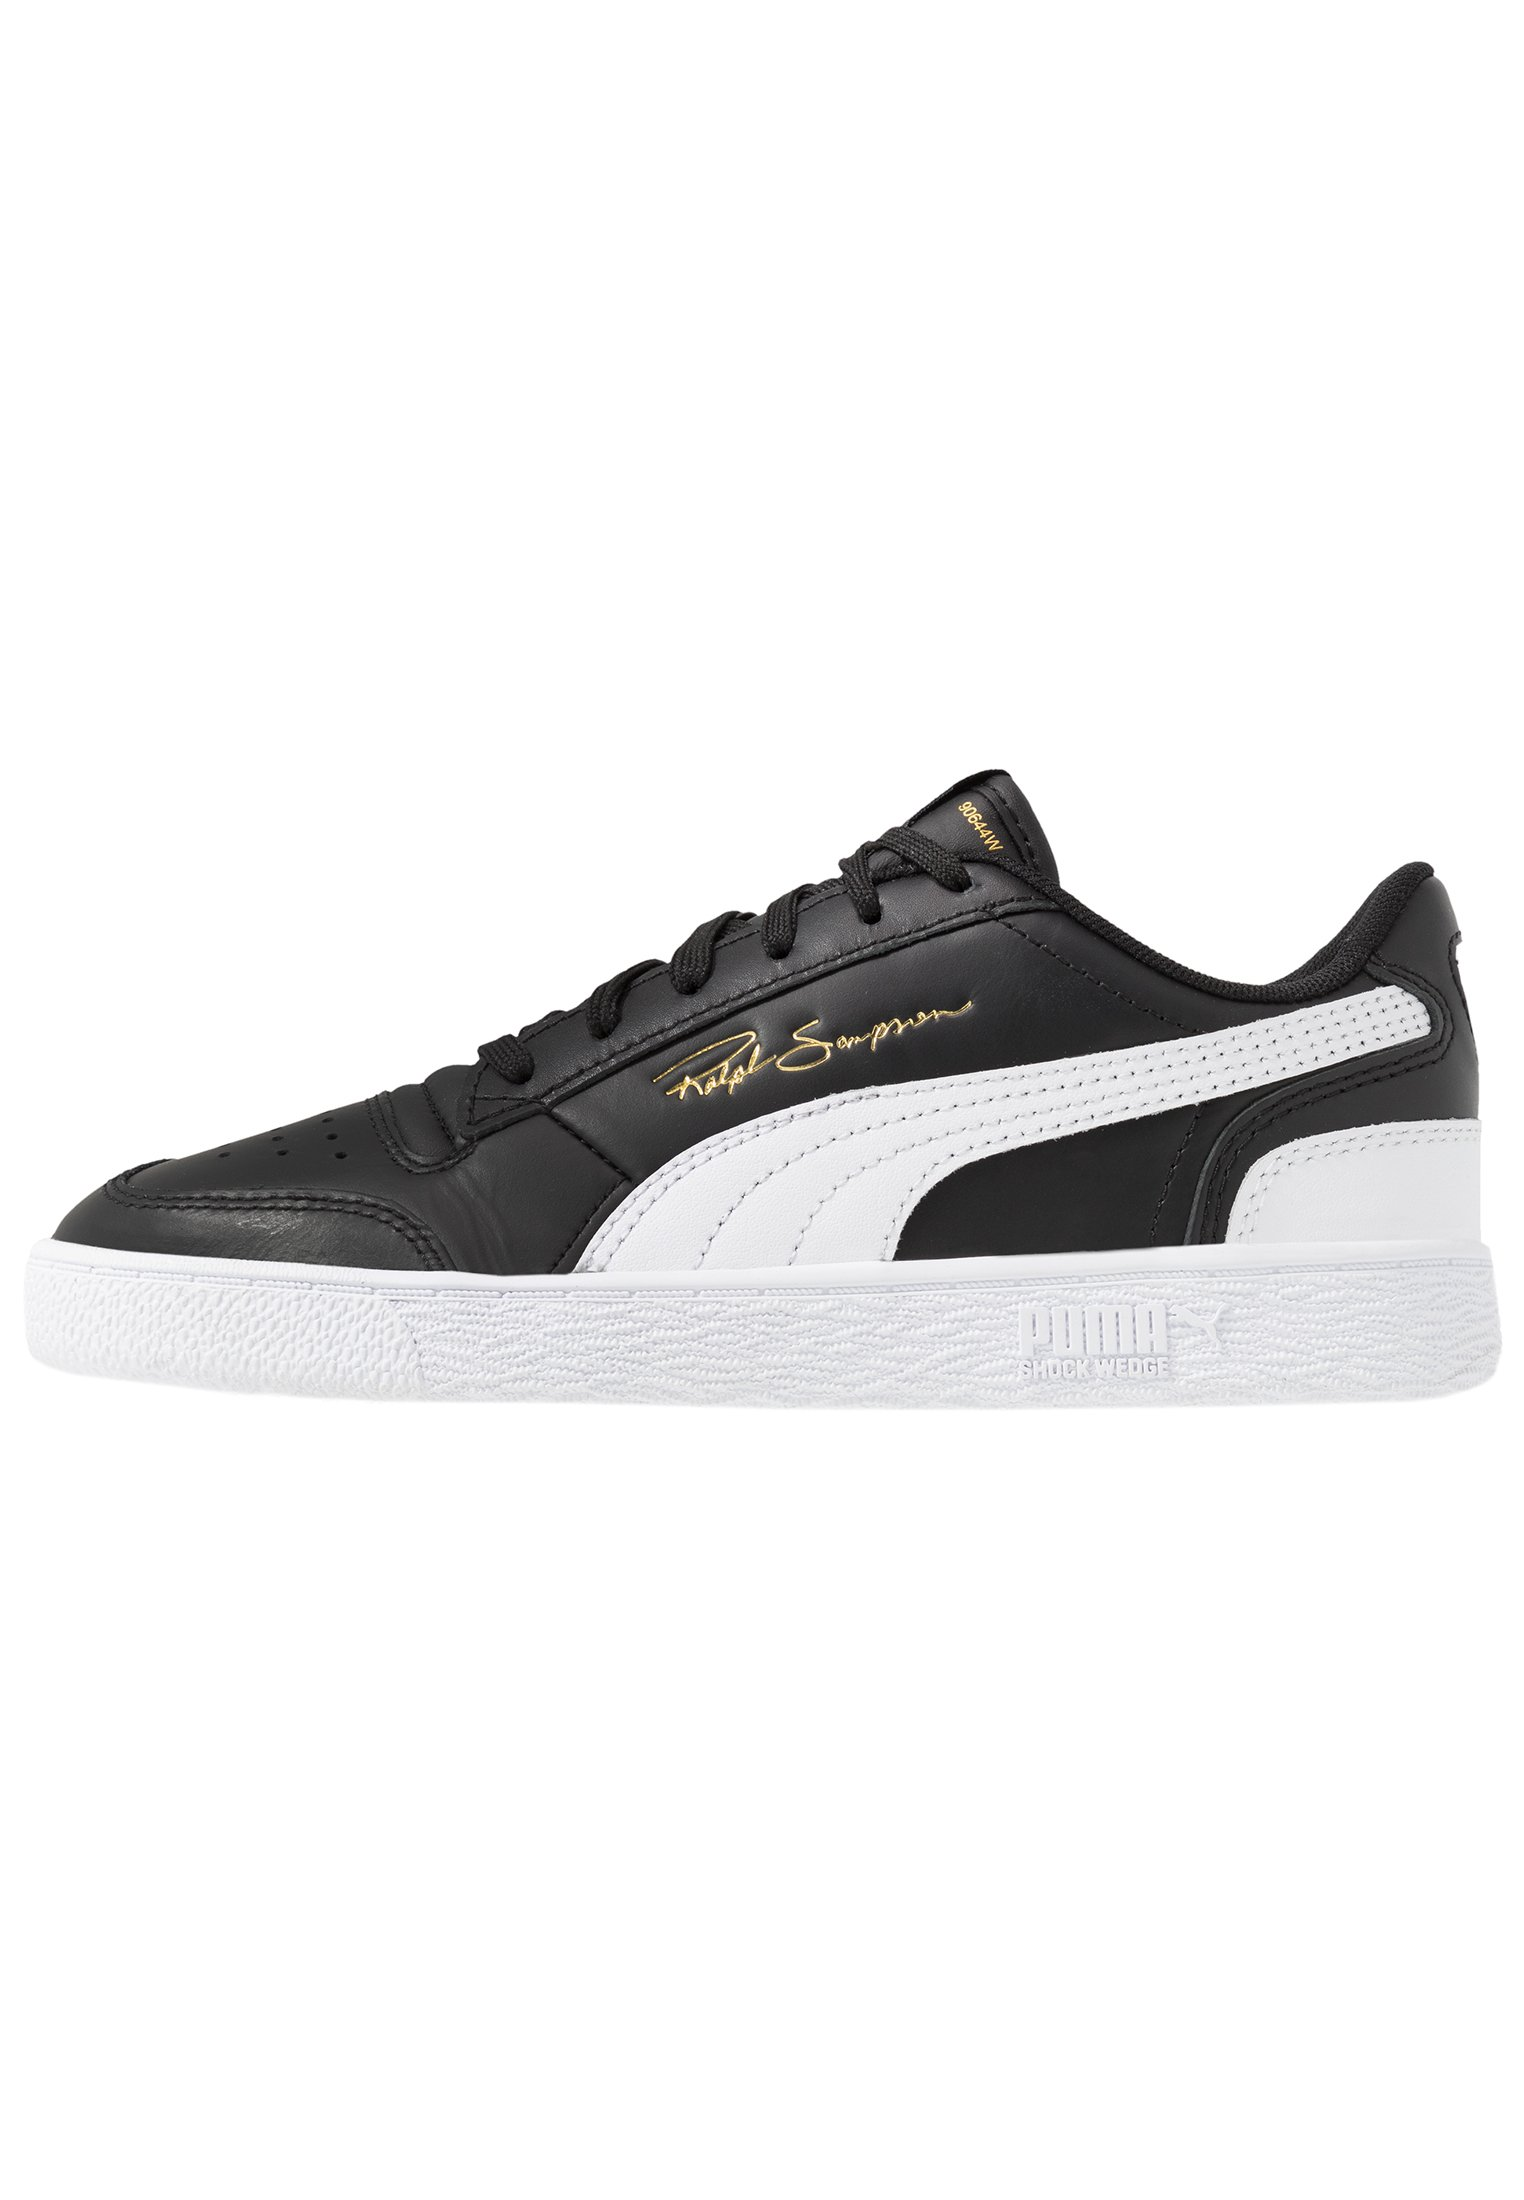 Puma RALPH SAMPSON UNISEX - Baskets basses - black/white/noir ...